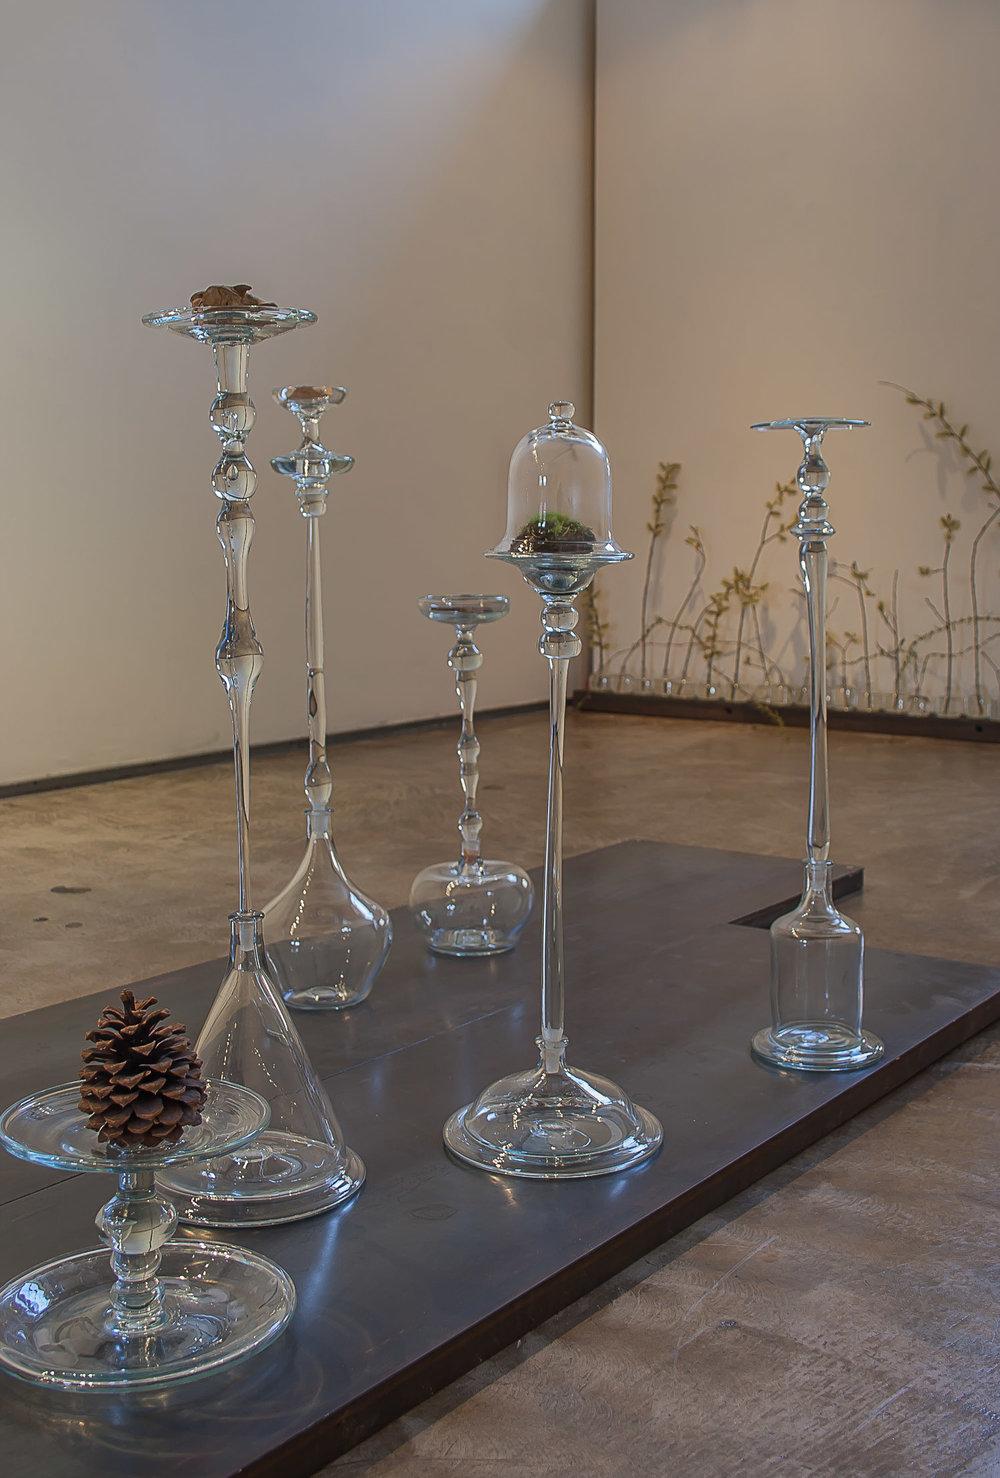 special pedestal exhibit